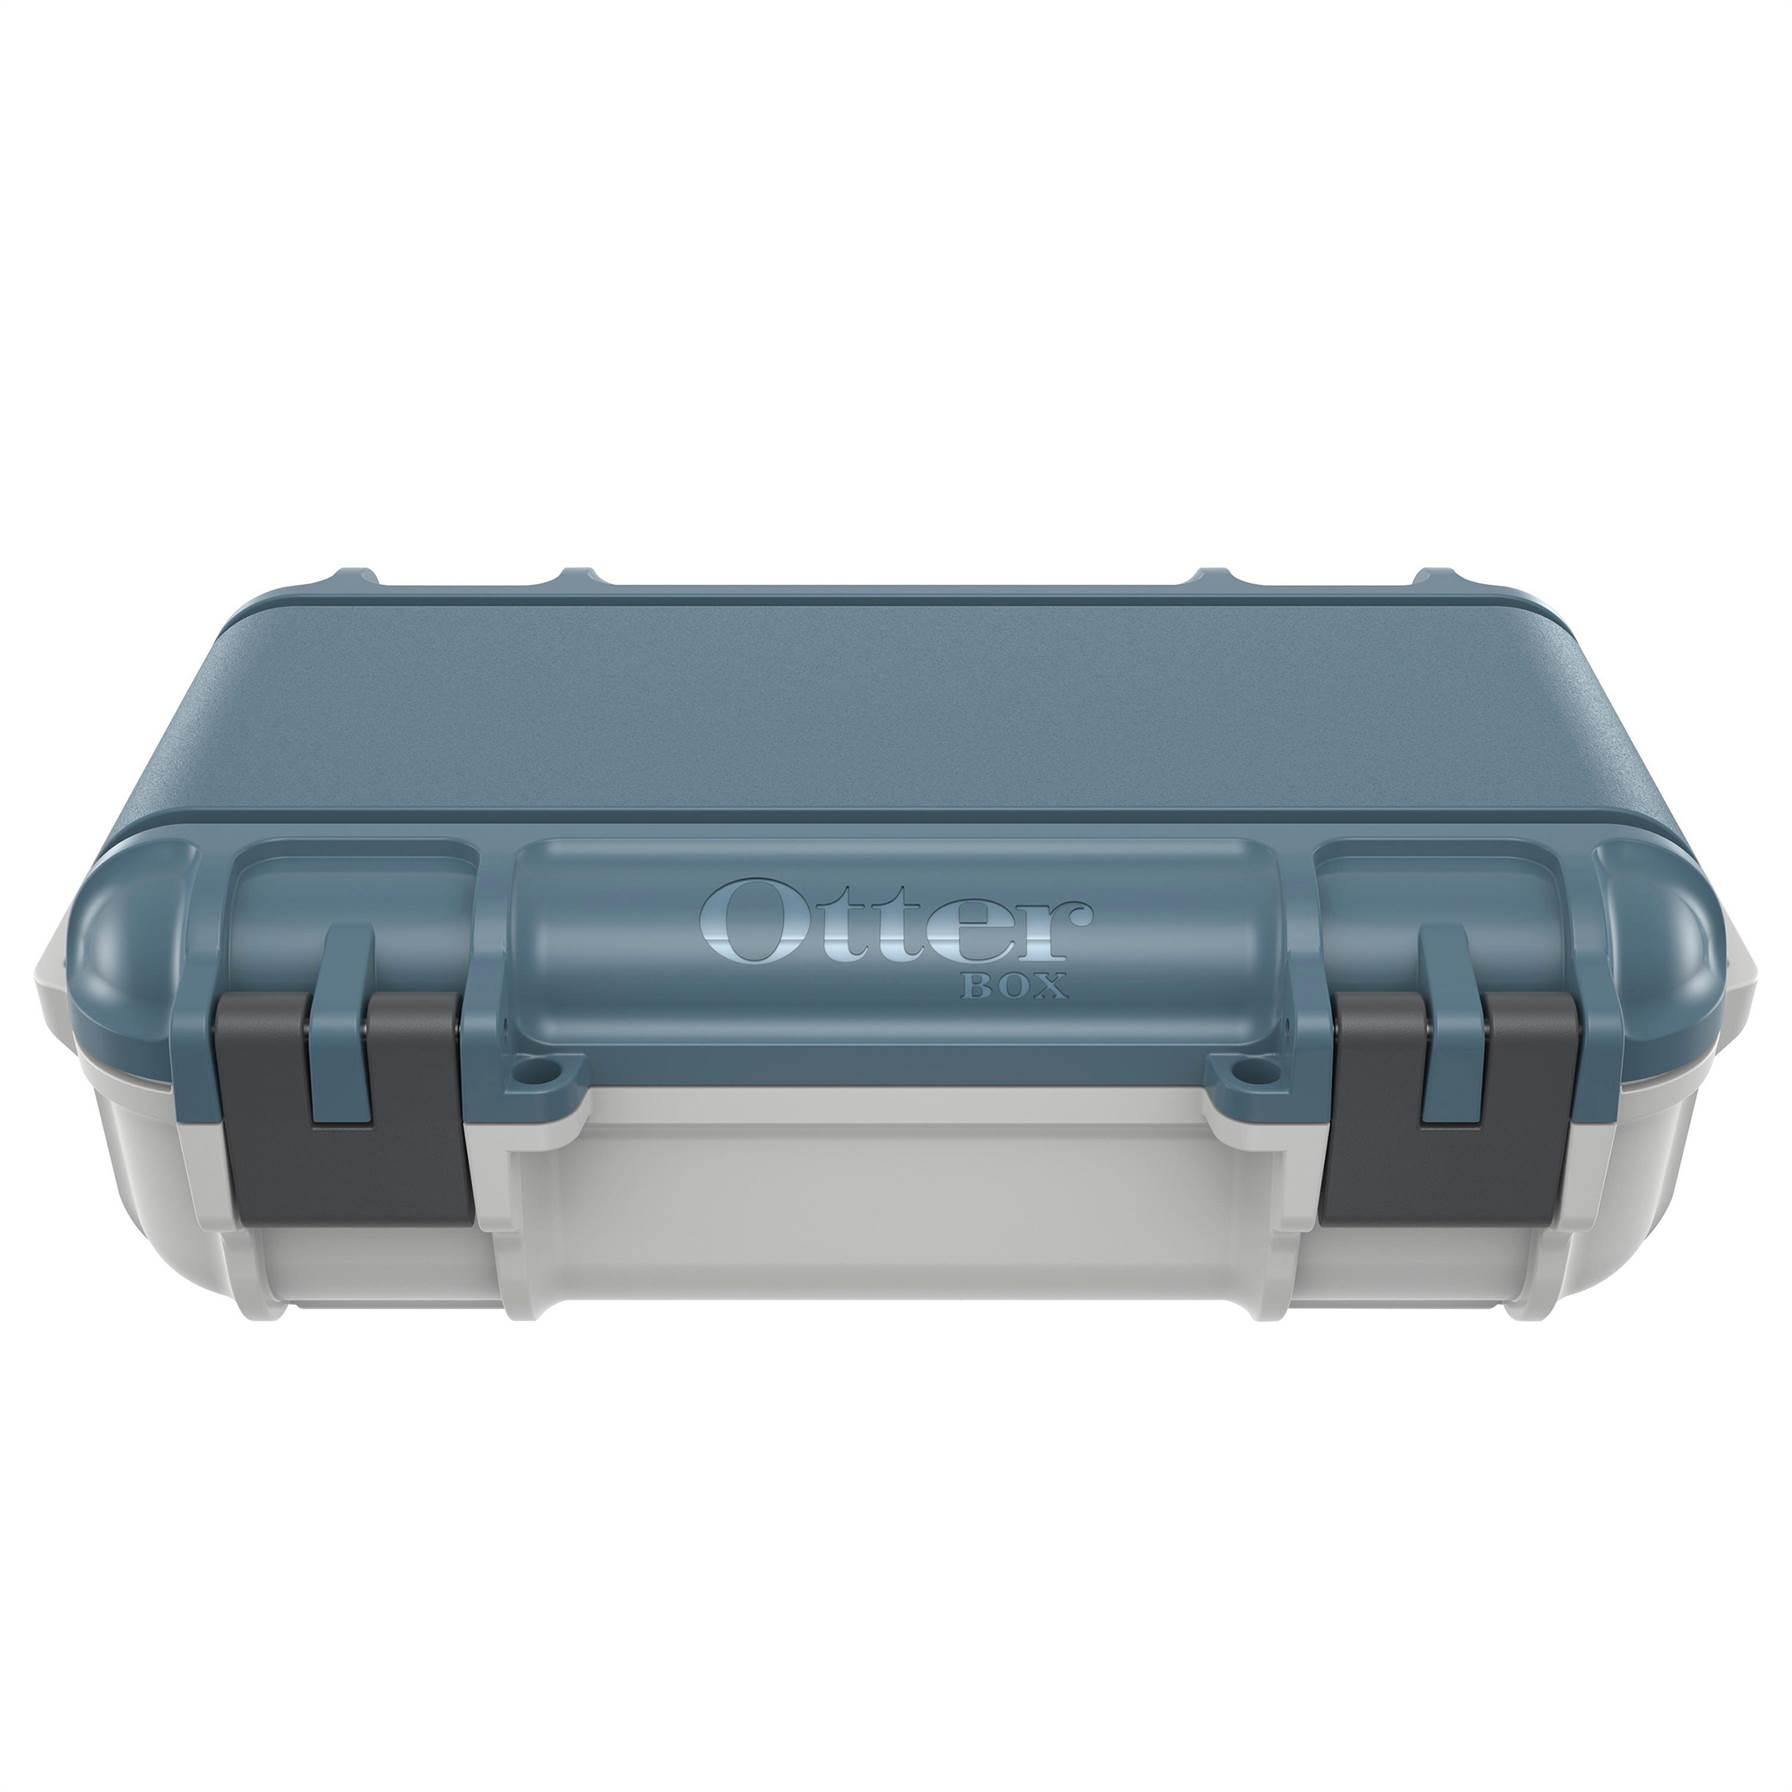 3250 Drybox Series - Hudson